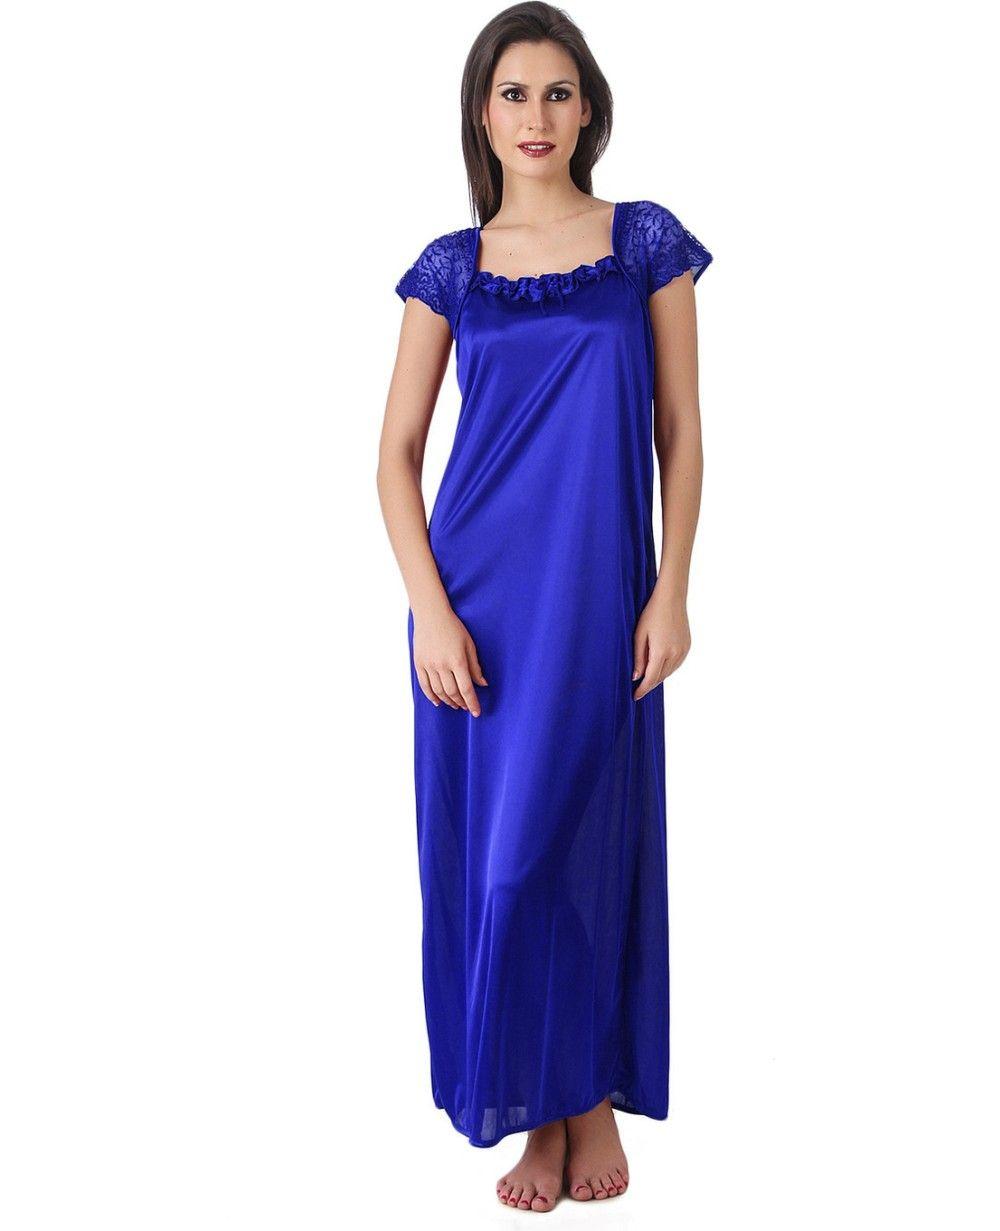 Women Satin Dark Blue Color One Piece Nighty, Night Suit, Night ...